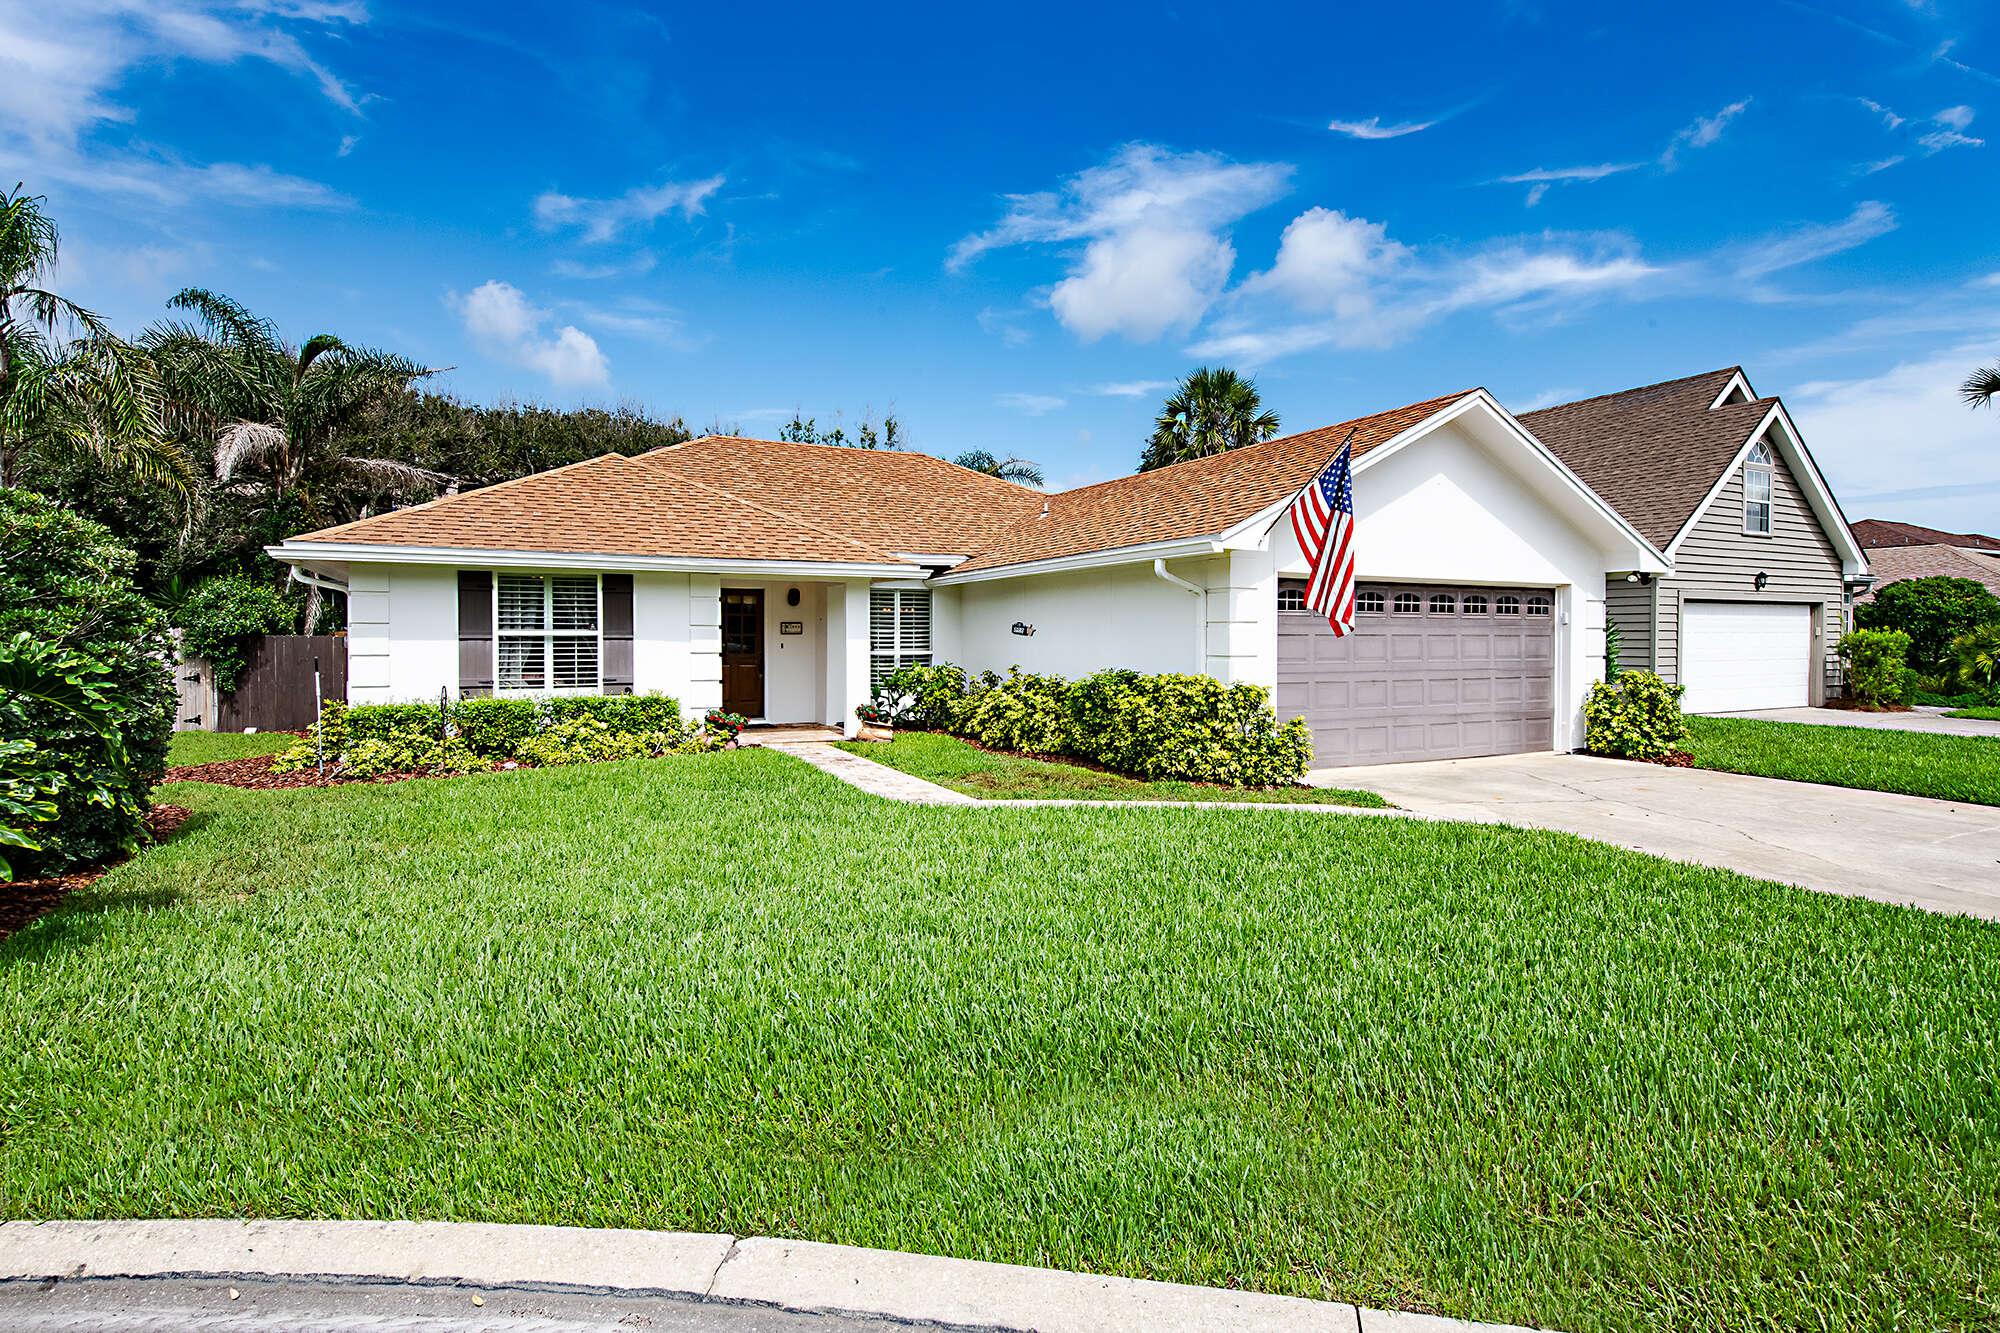 Single Family for Sale at 1864 Beachside Court Atlantic Beach, Florida 32233 United States